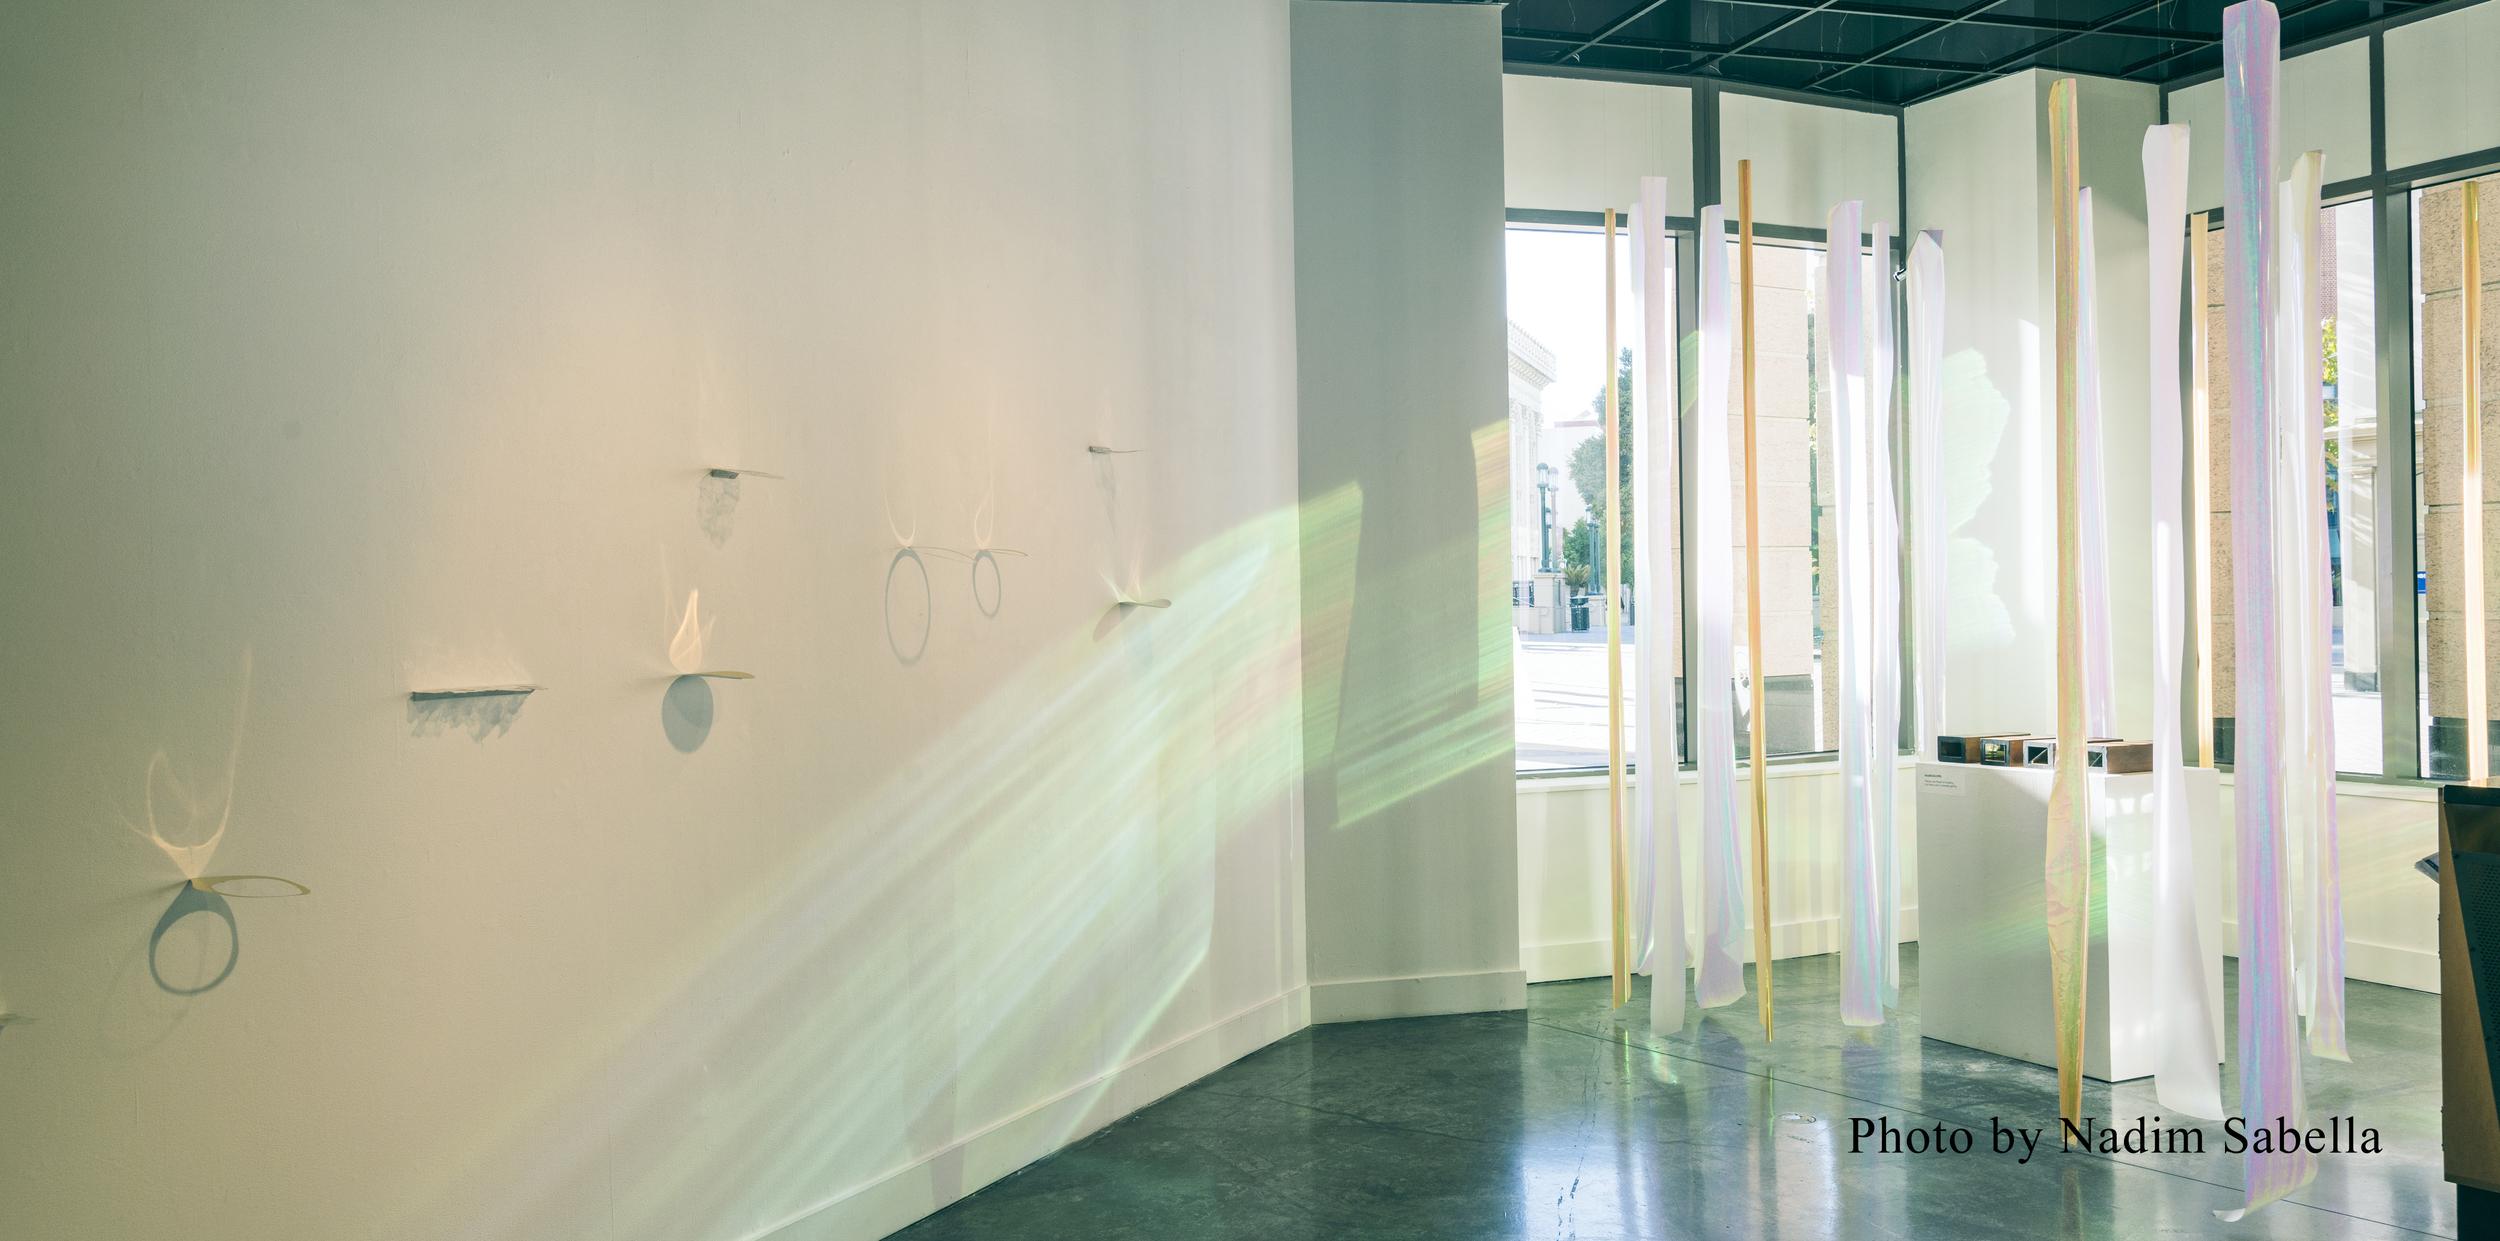 Ali Nashke Messing Installation Shots Edited 5 (1).jpg